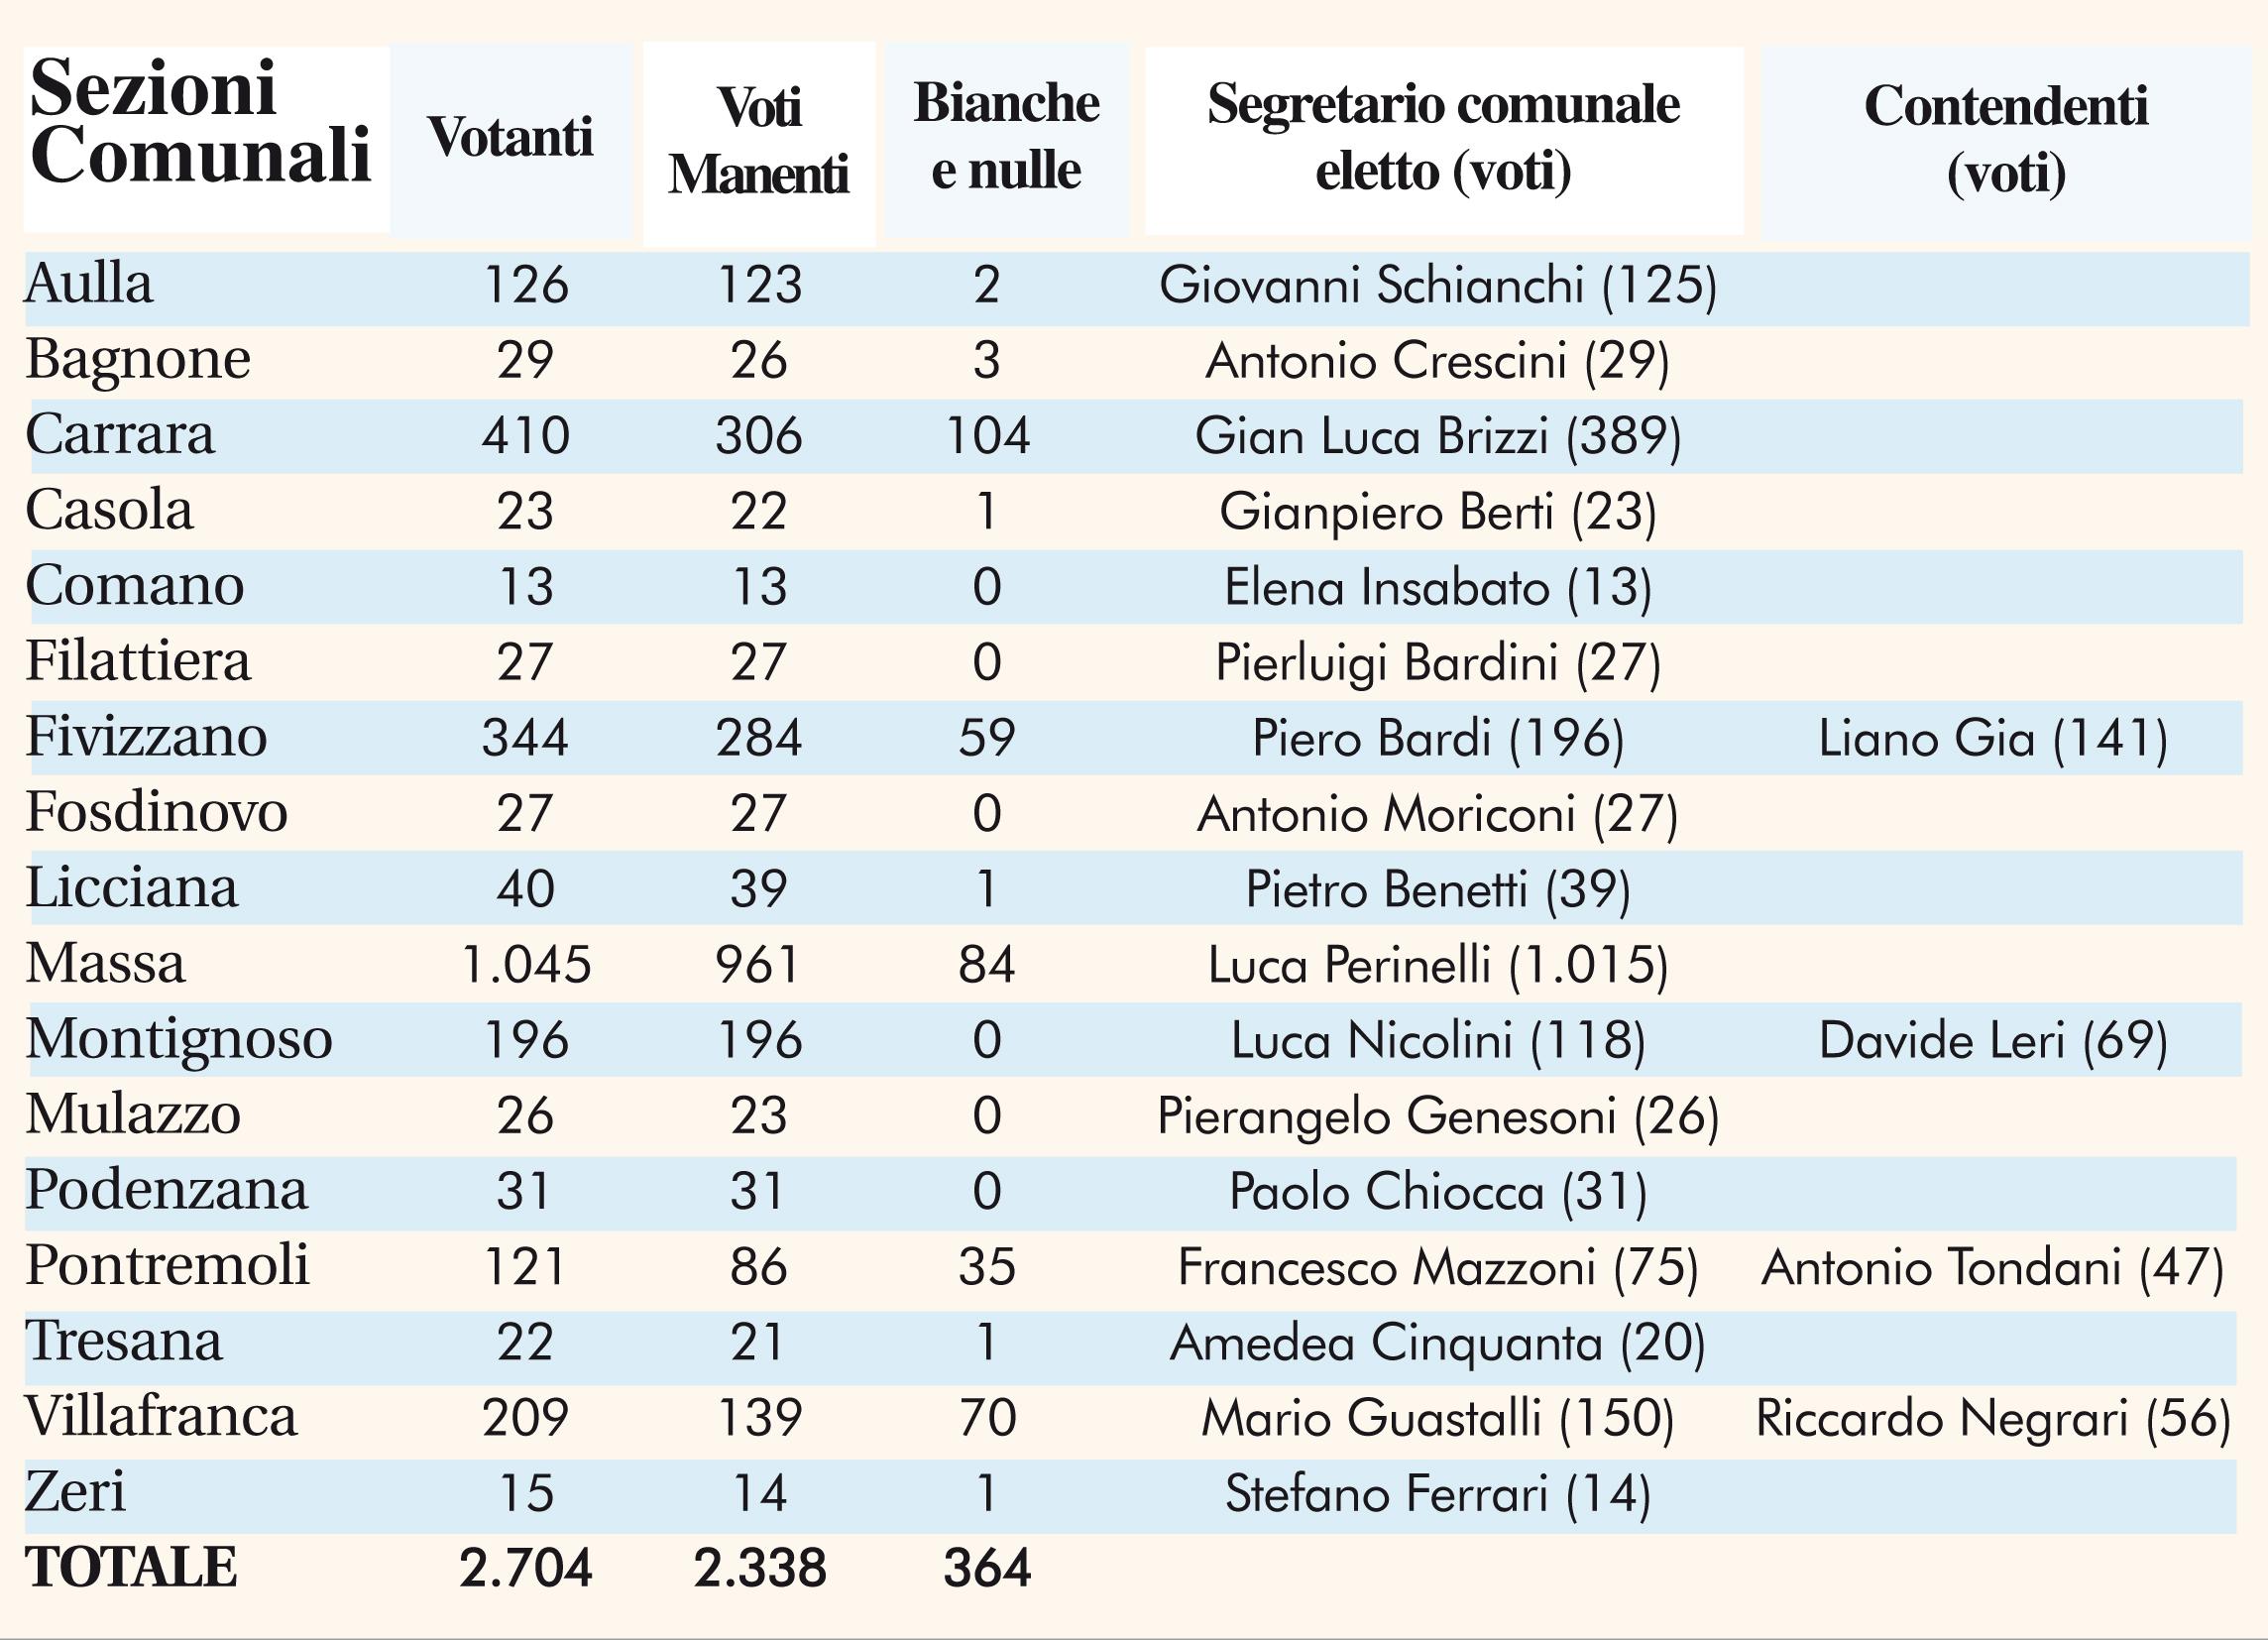 Le tabelle con il voto nelle varie sezioni provinciali